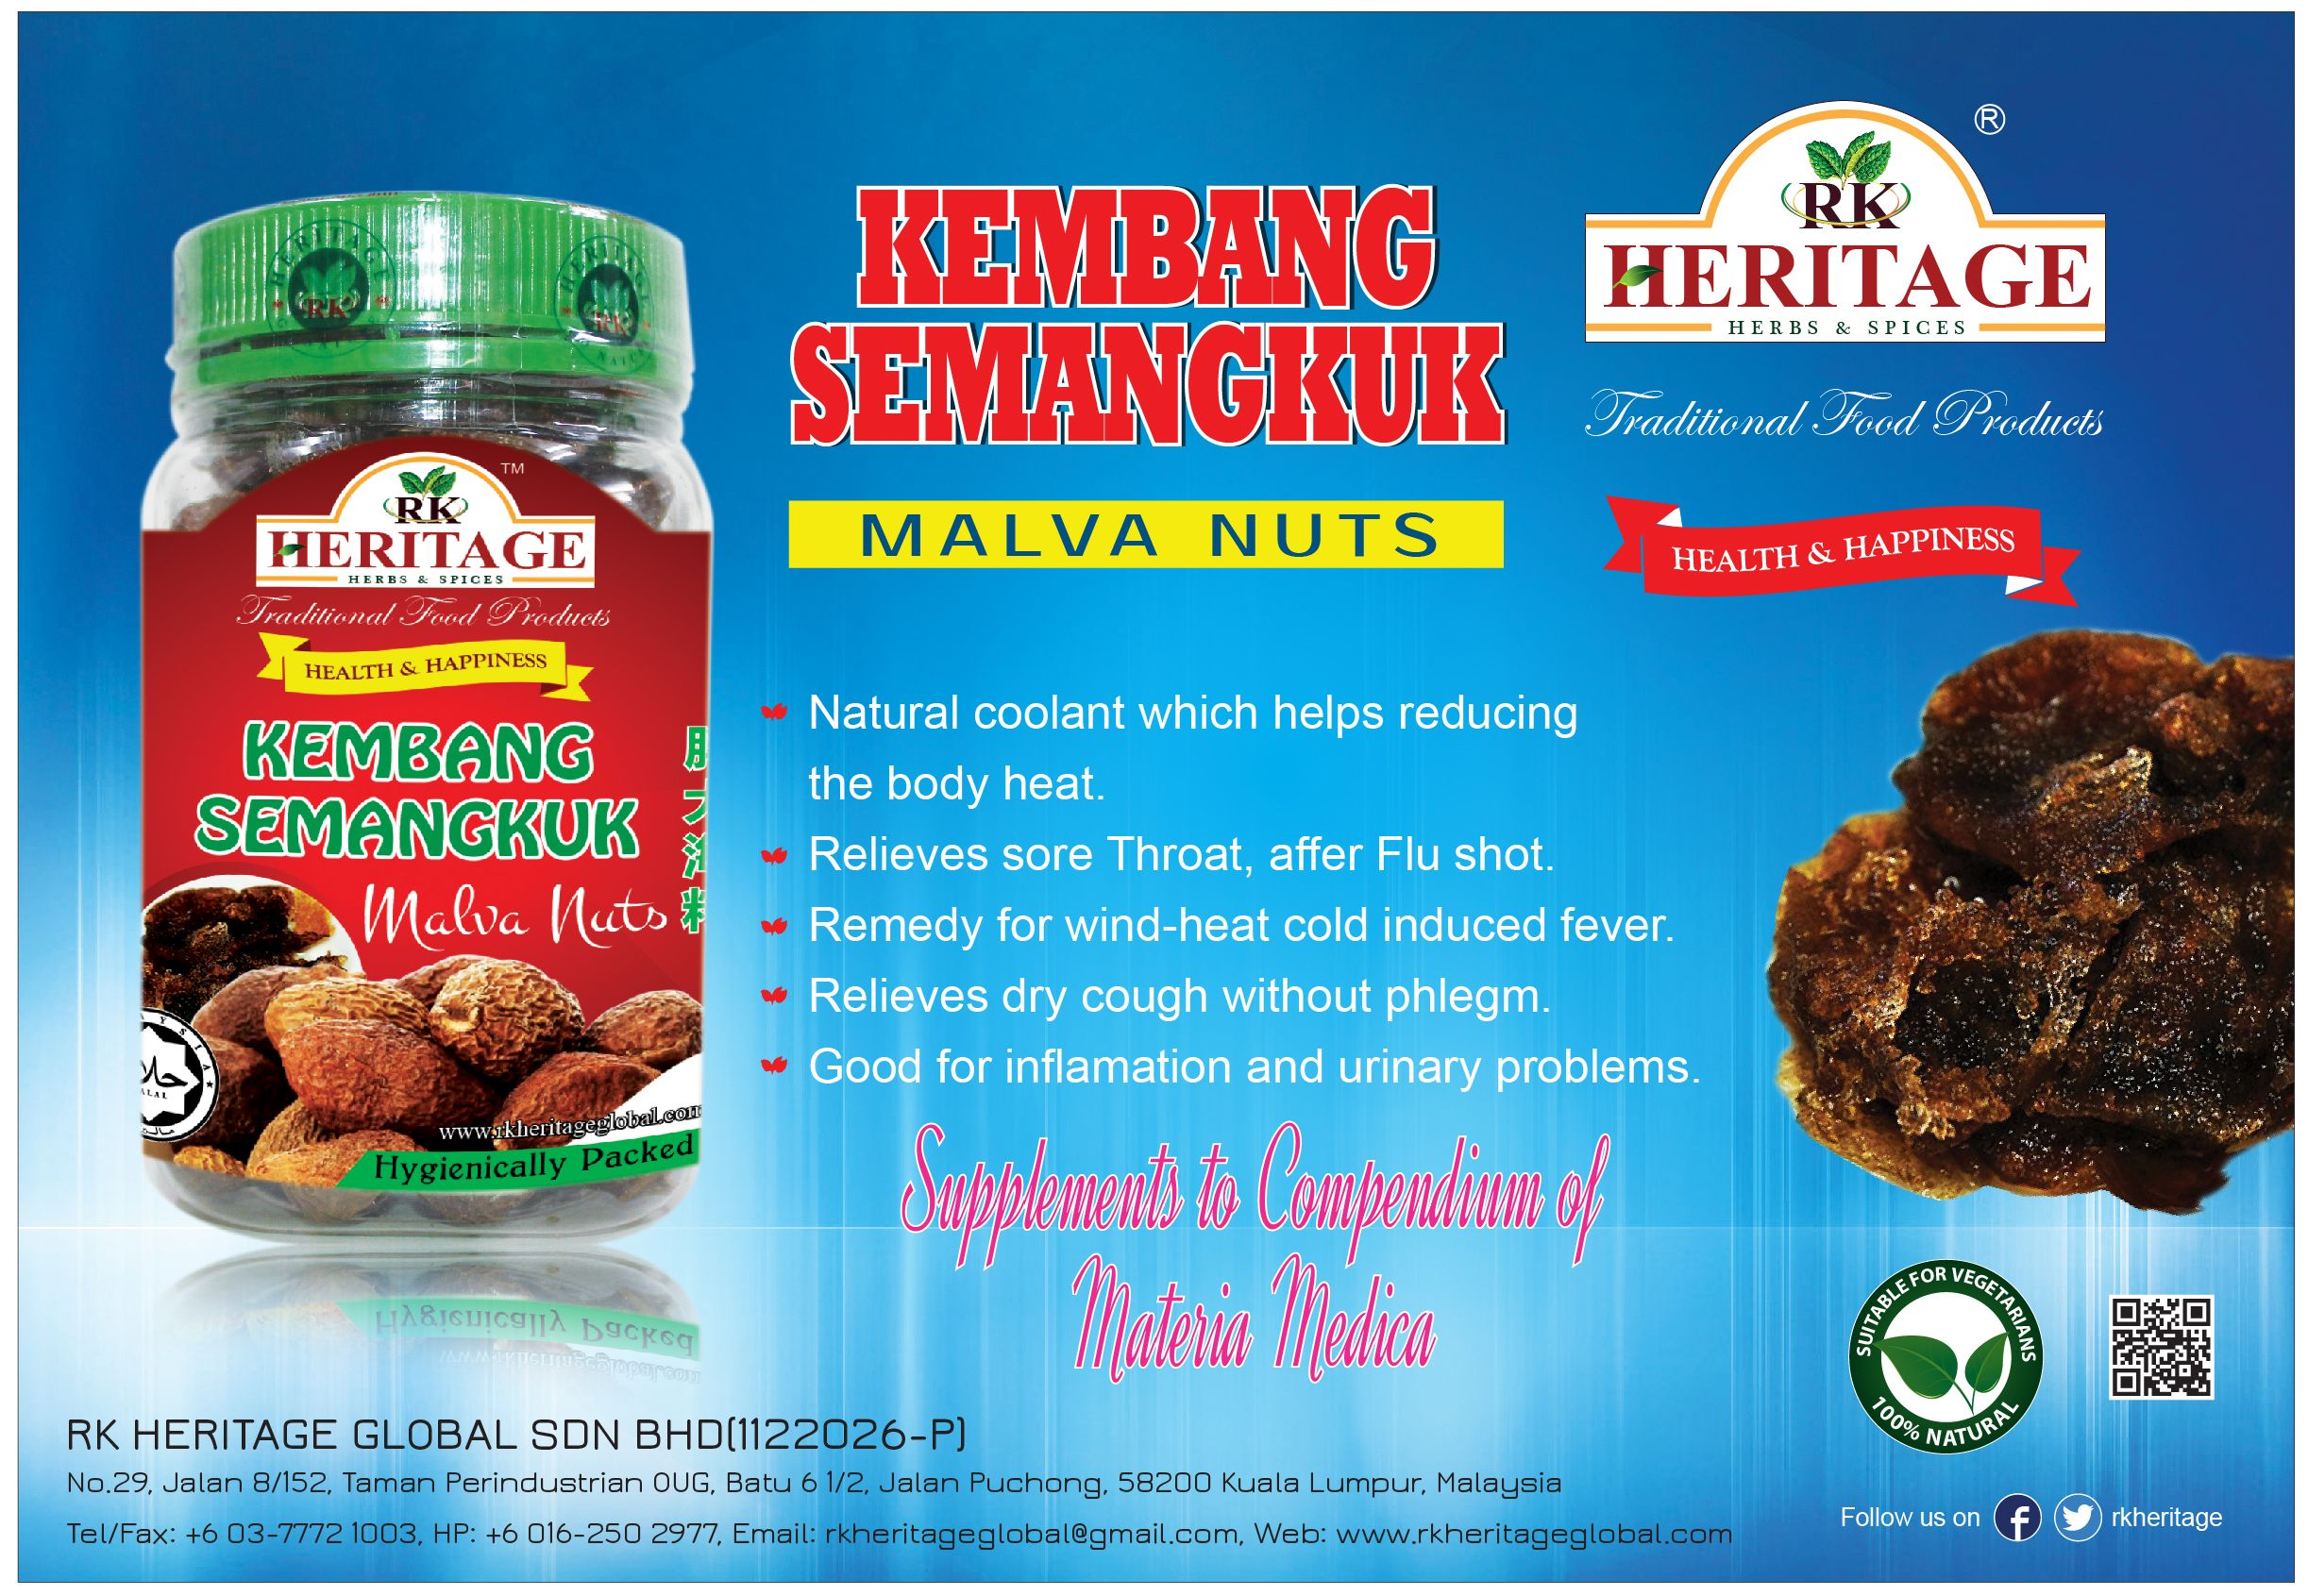 RK HERITAGE HEALTHY HERBAL FOODS KEMBANG SEMANGKUK / MALVA